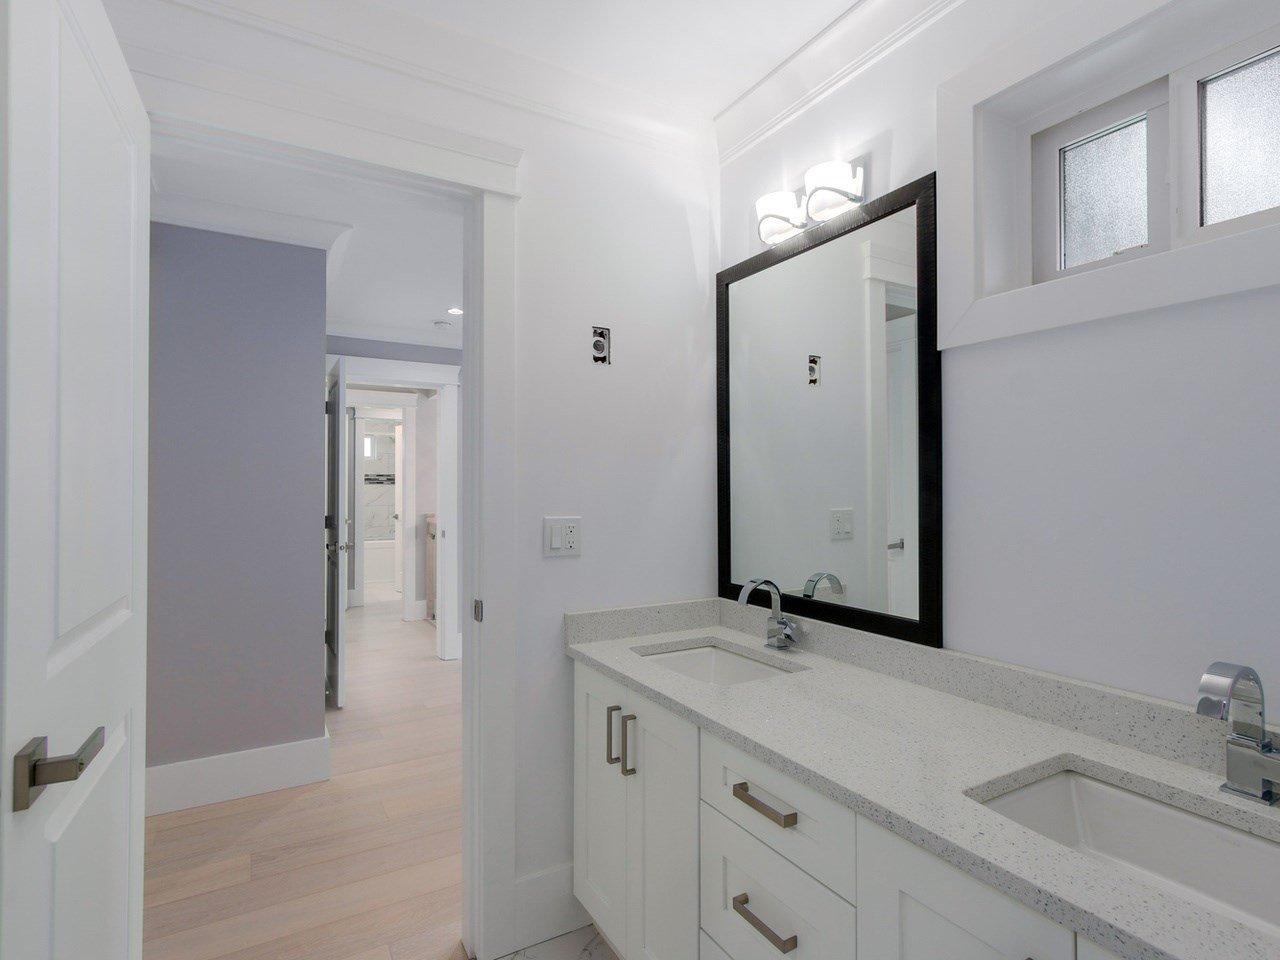 Photo 16: Photos: 1560 MAPLE Street: White Rock House for sale (South Surrey White Rock)  : MLS®# R2138926